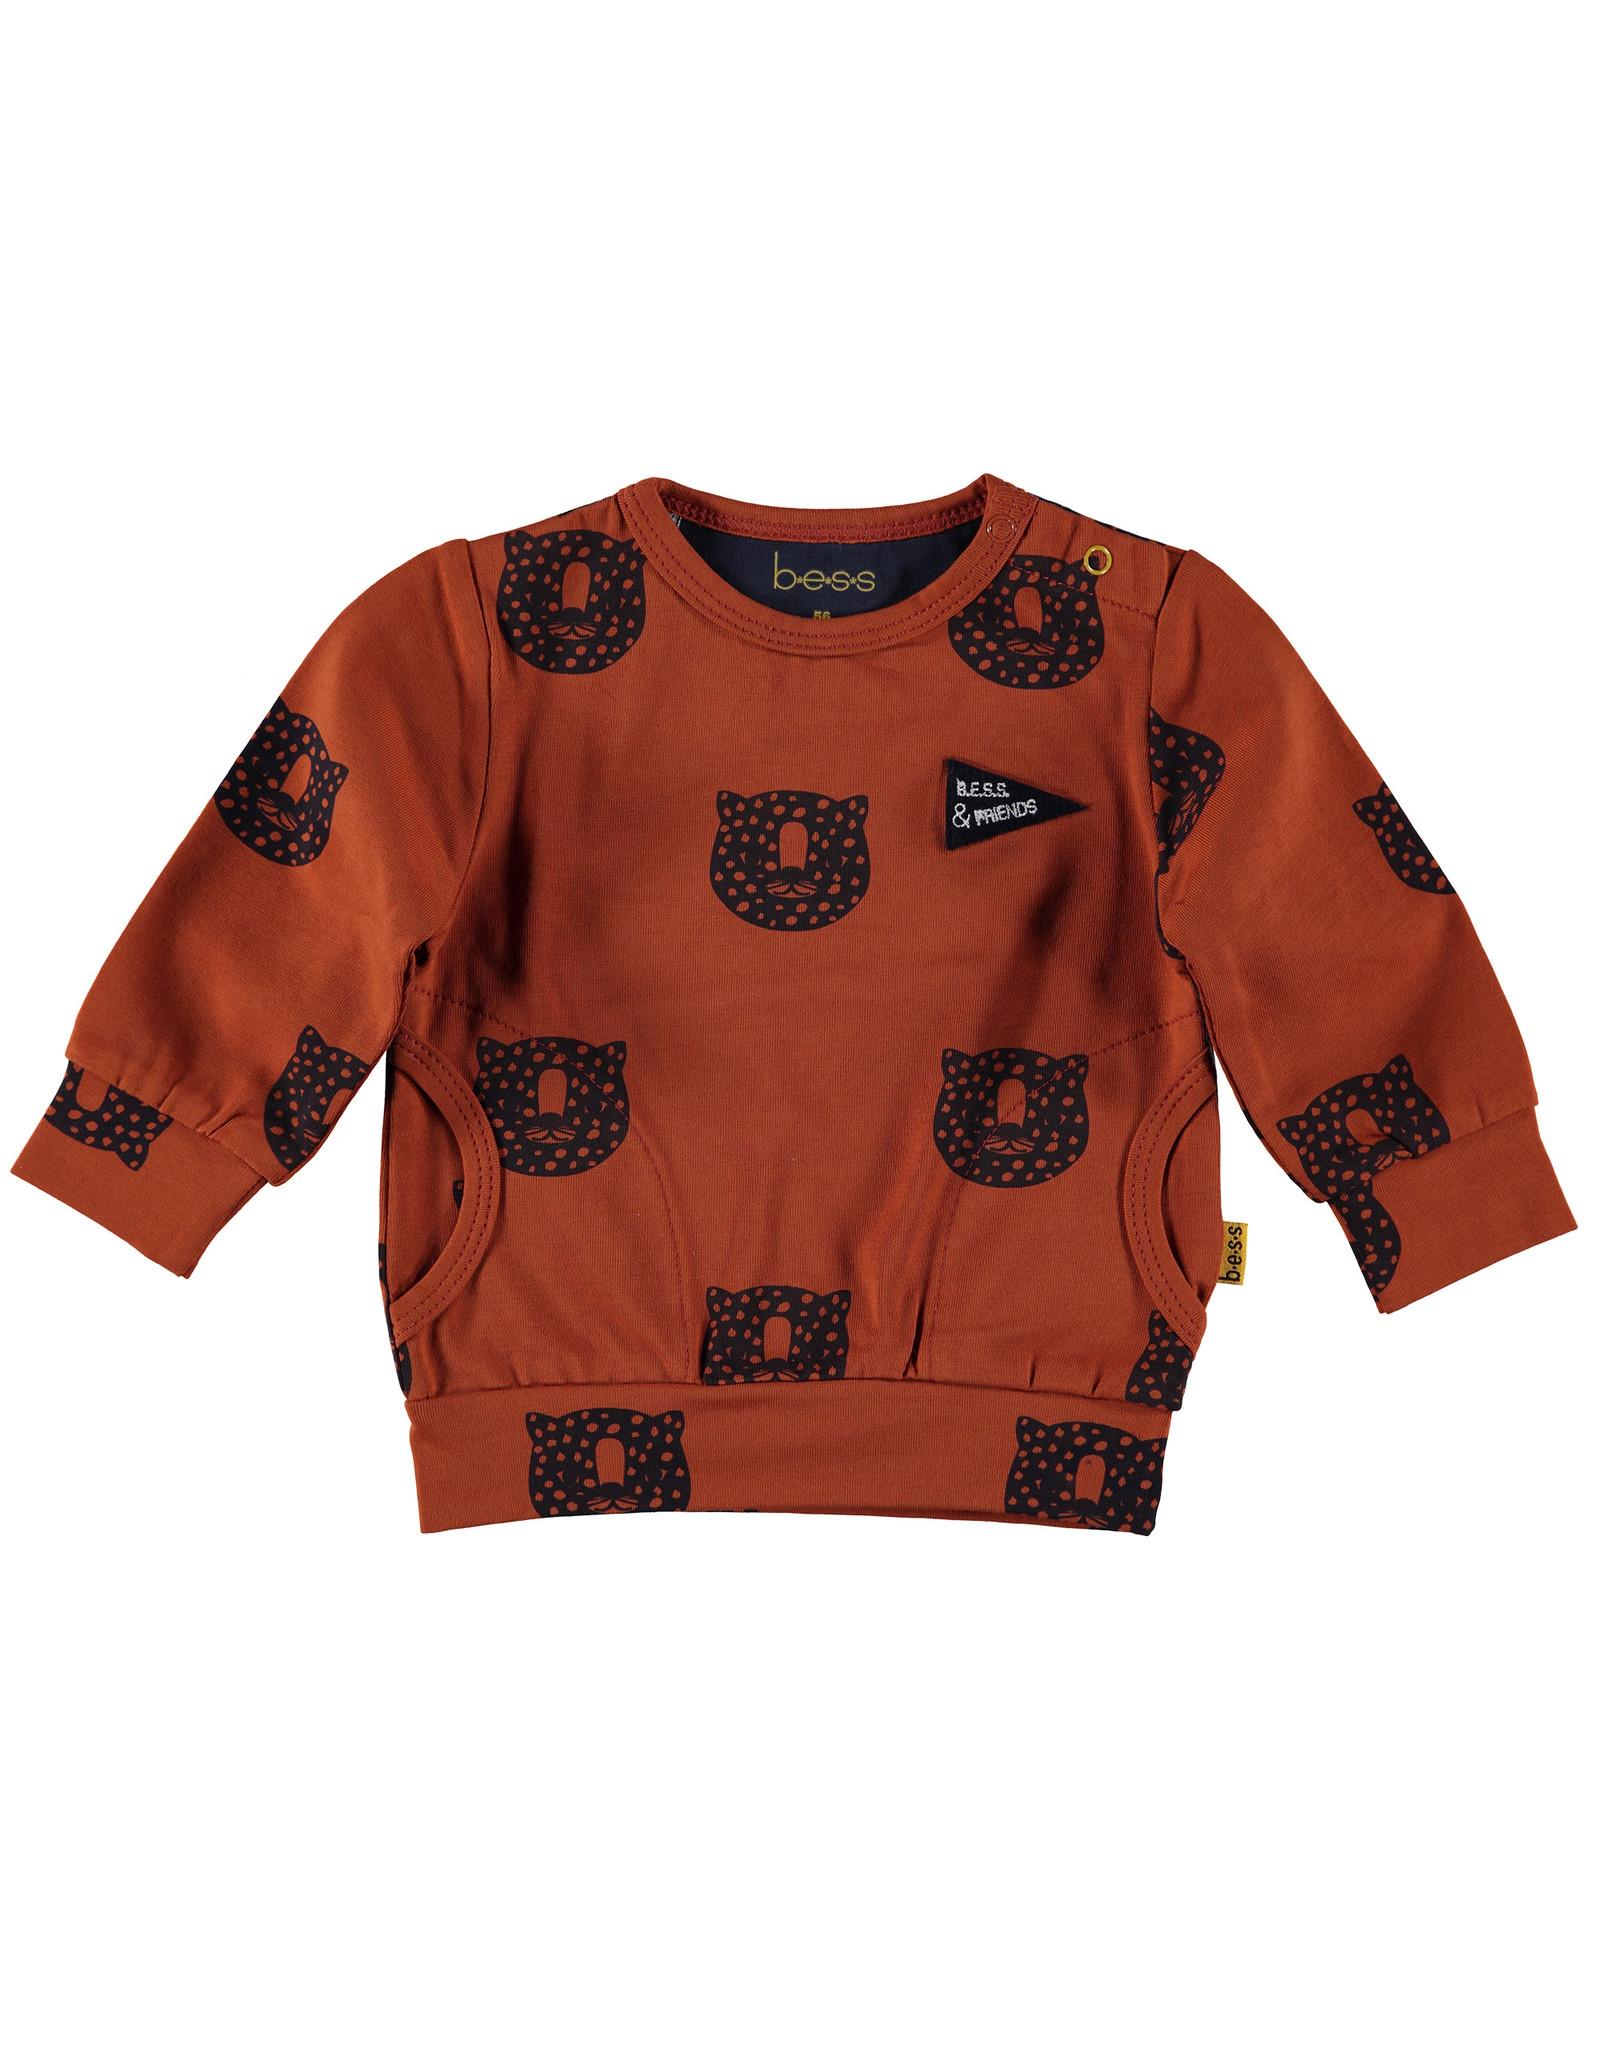 B.E.S.S. Sweater AOP Tiger, Rusty